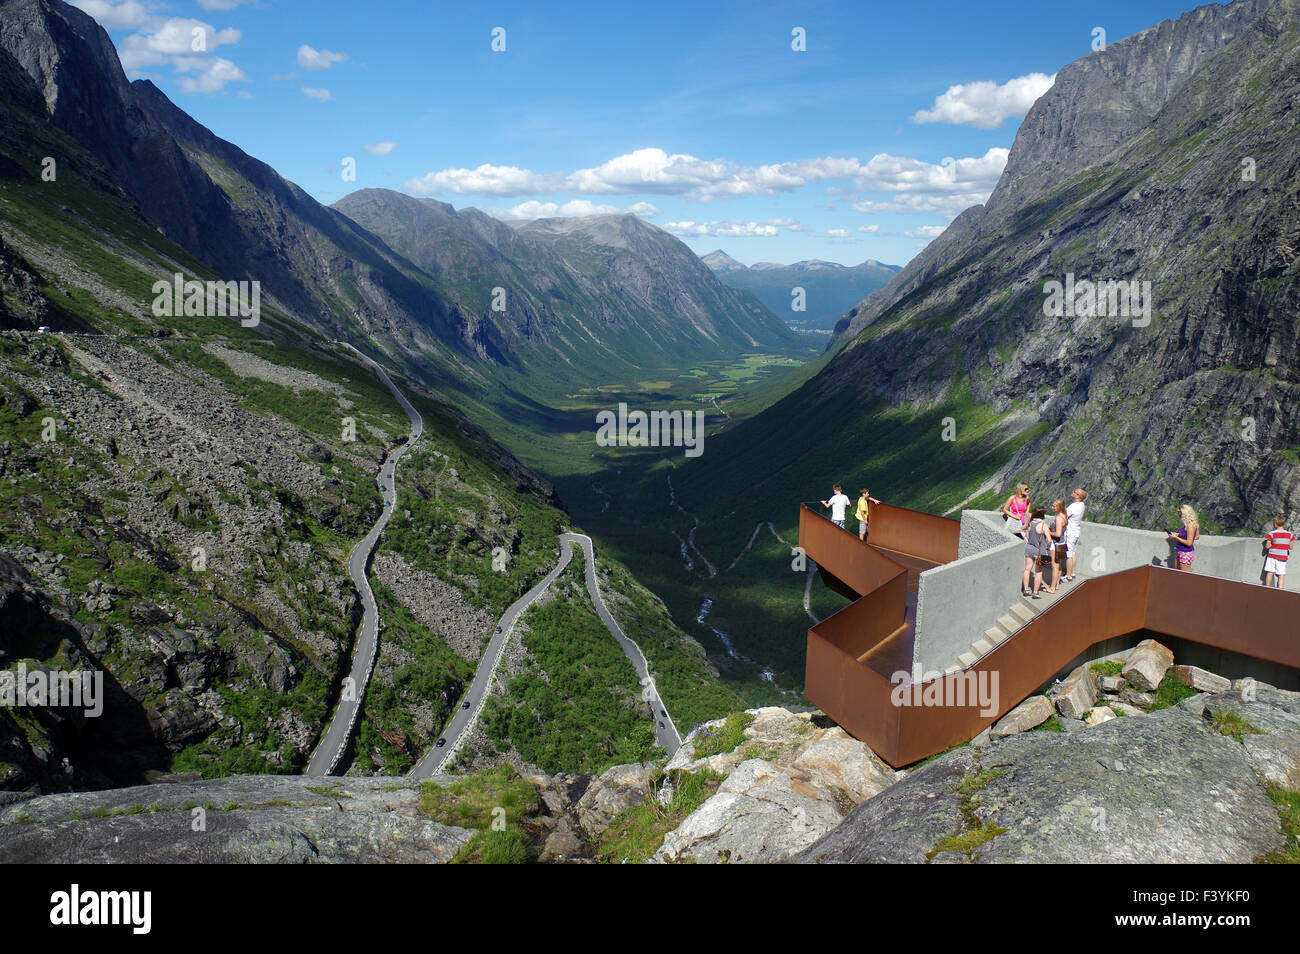 Viewing platforn at Trollstigen - Stock Image